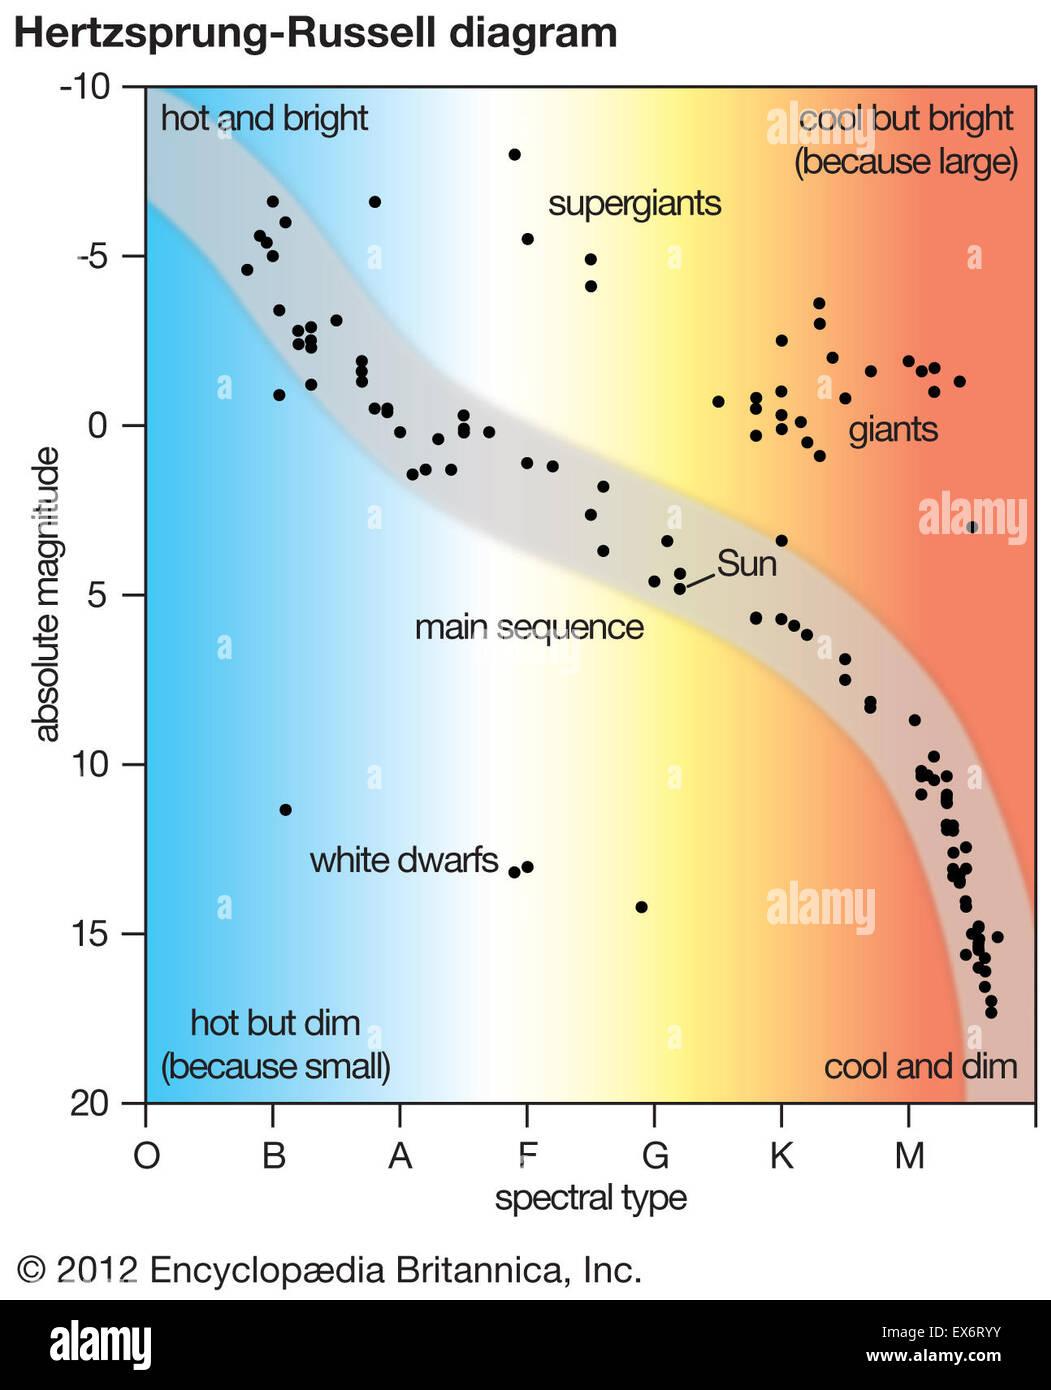 Hertzsprung Russell Diagram Stock Photo Royalty Free Image